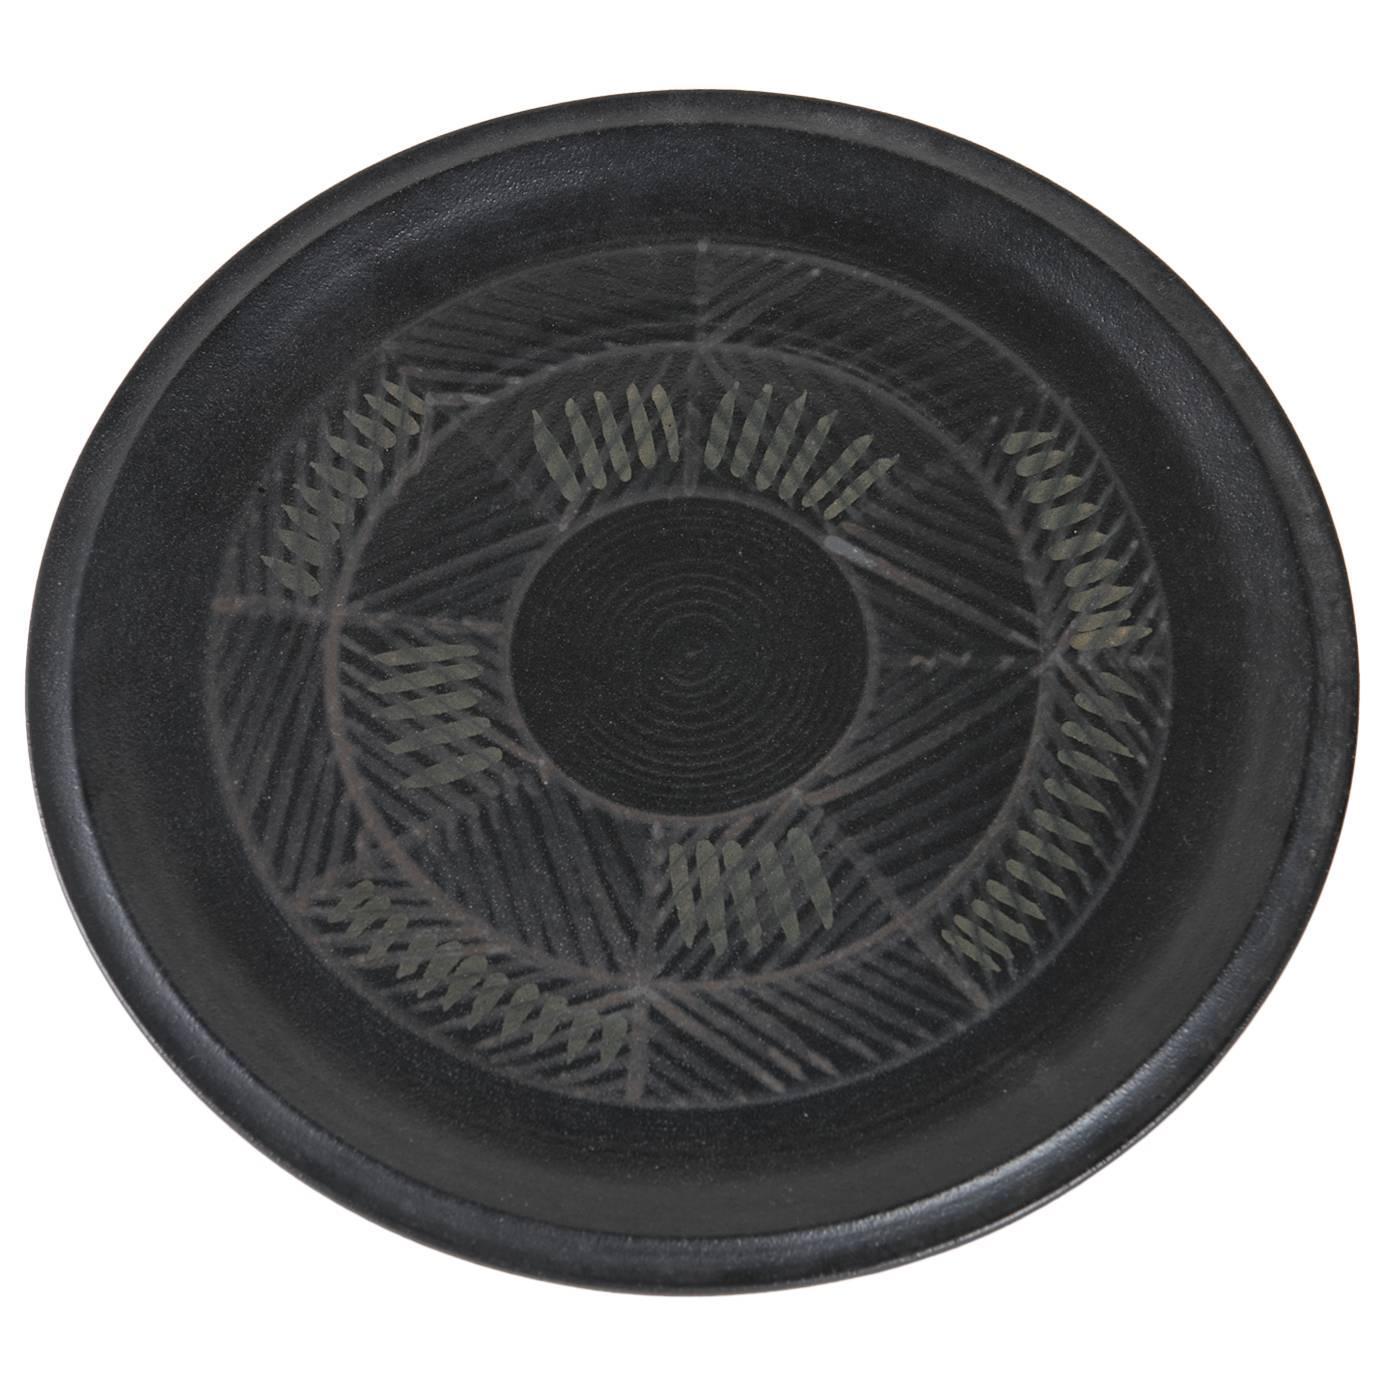 Ceramic Centerpiece by Tasca